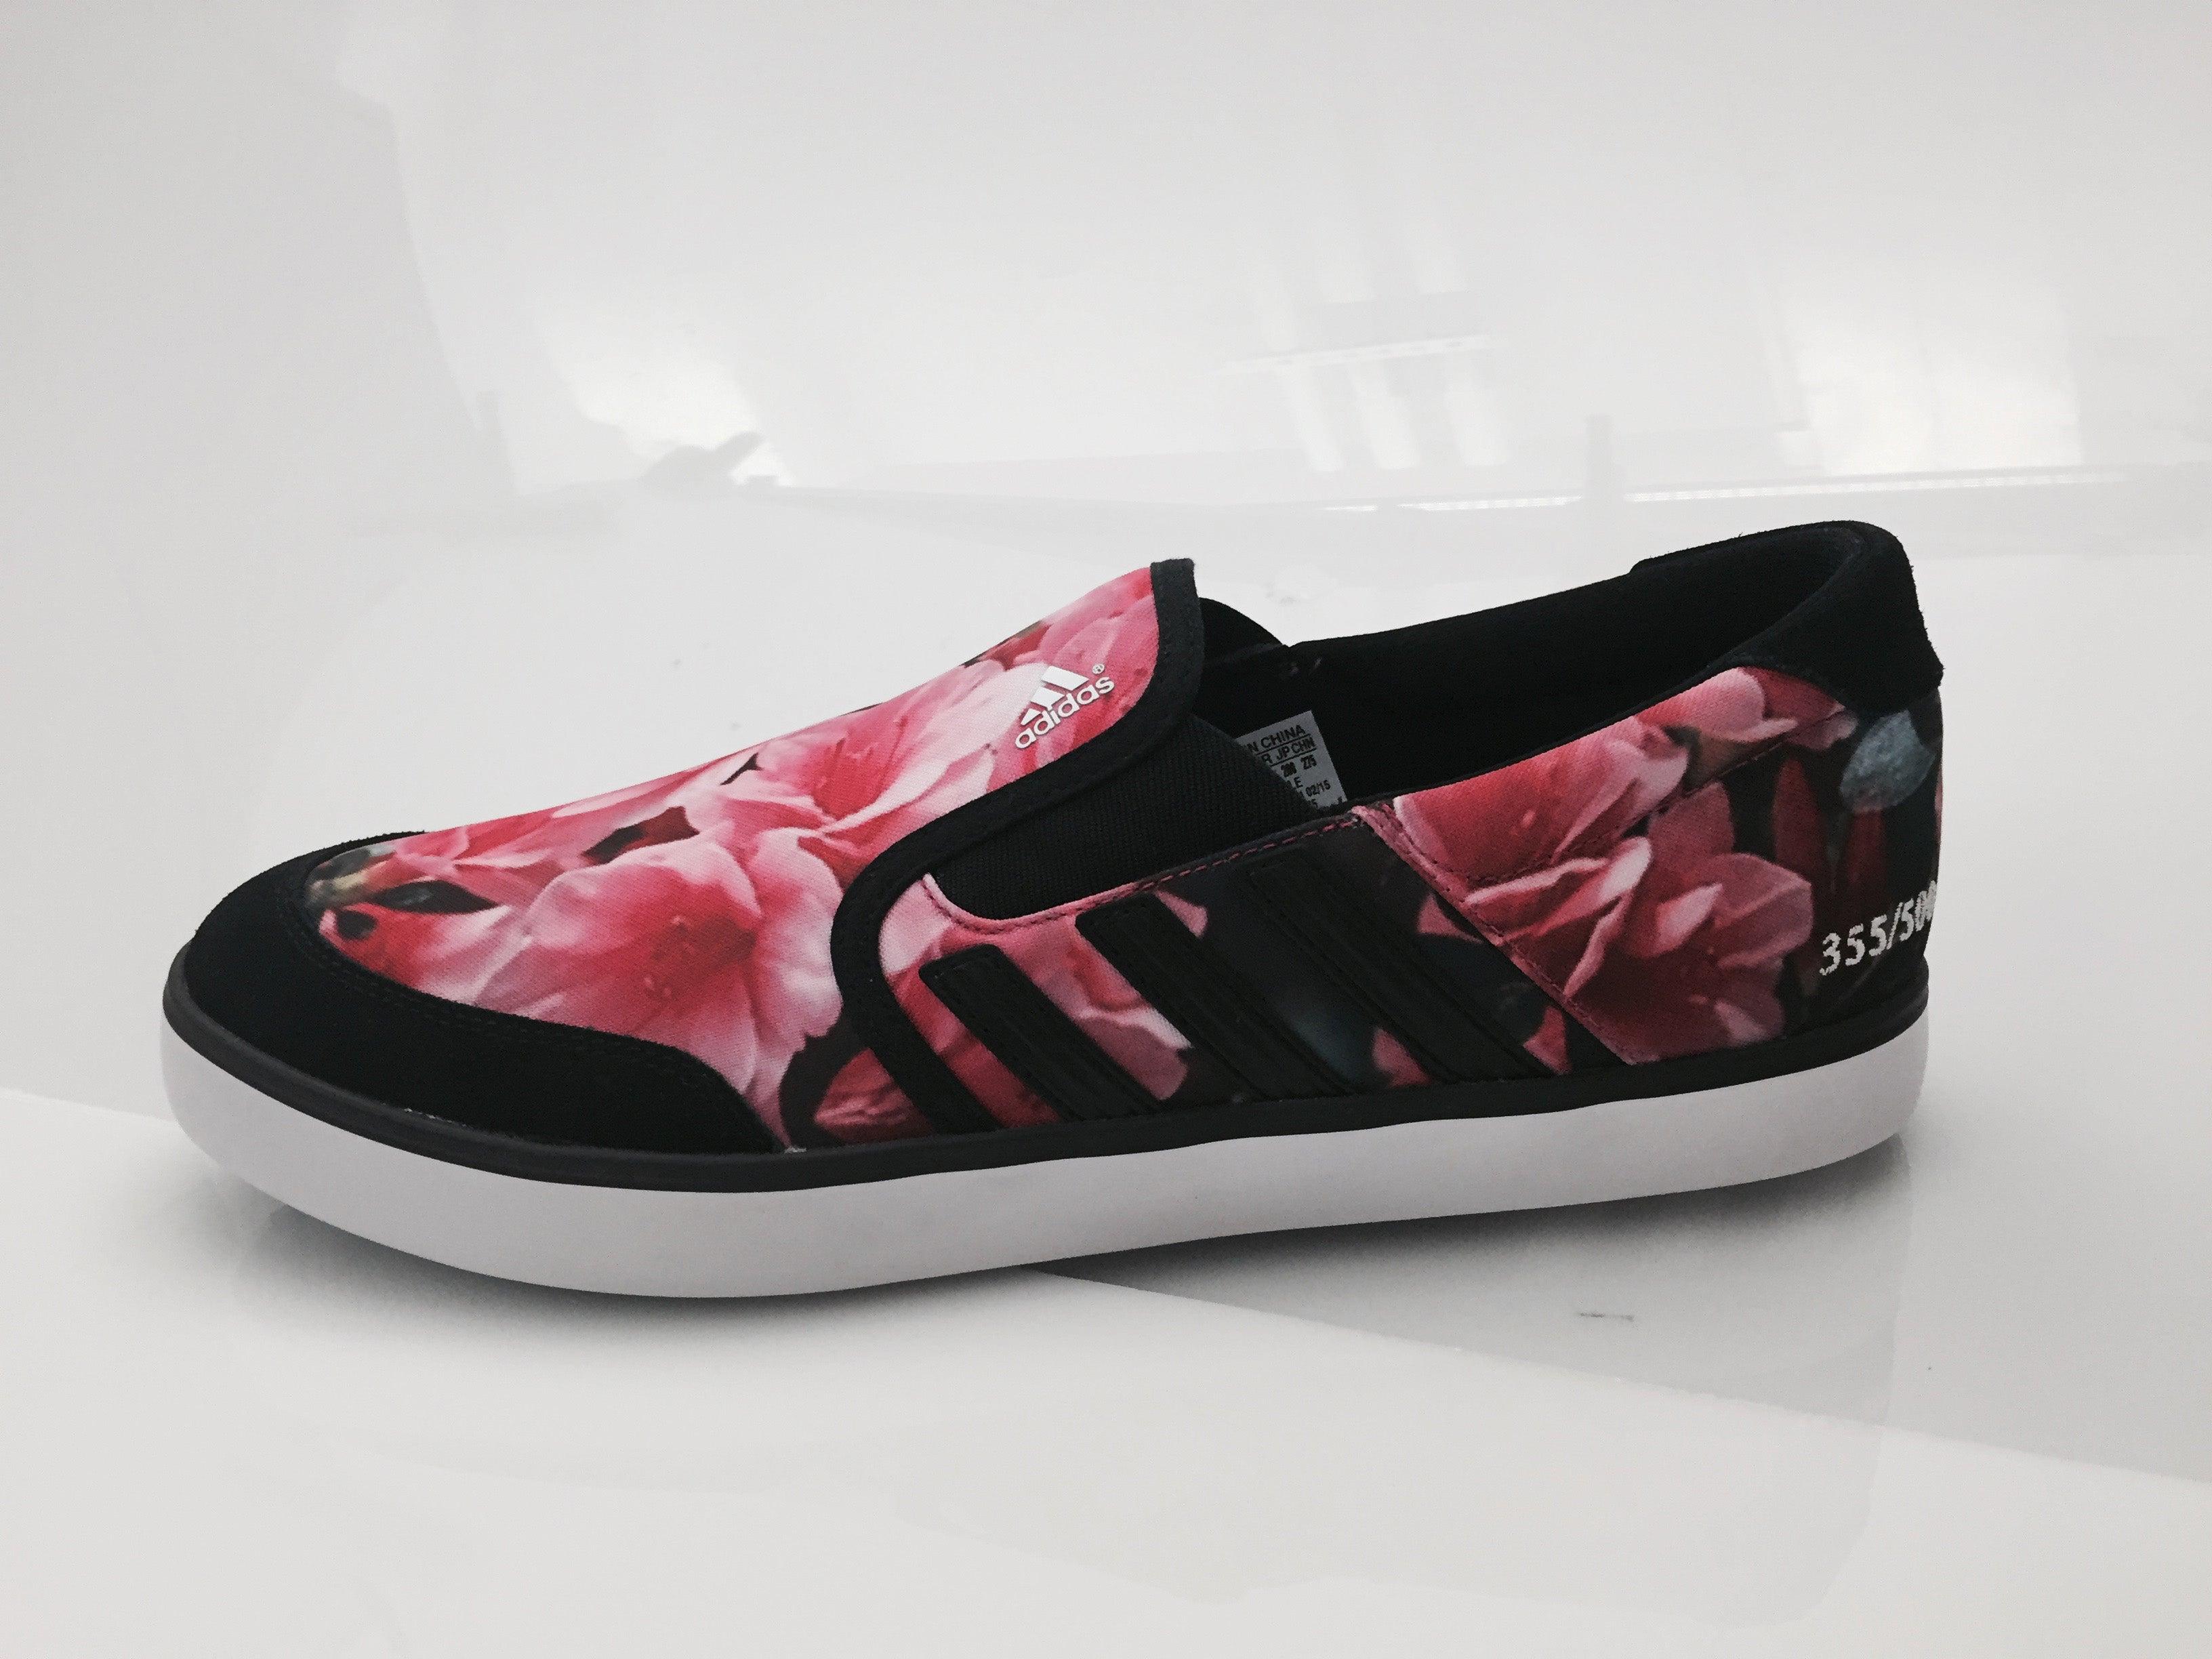 shoe_main.jpg